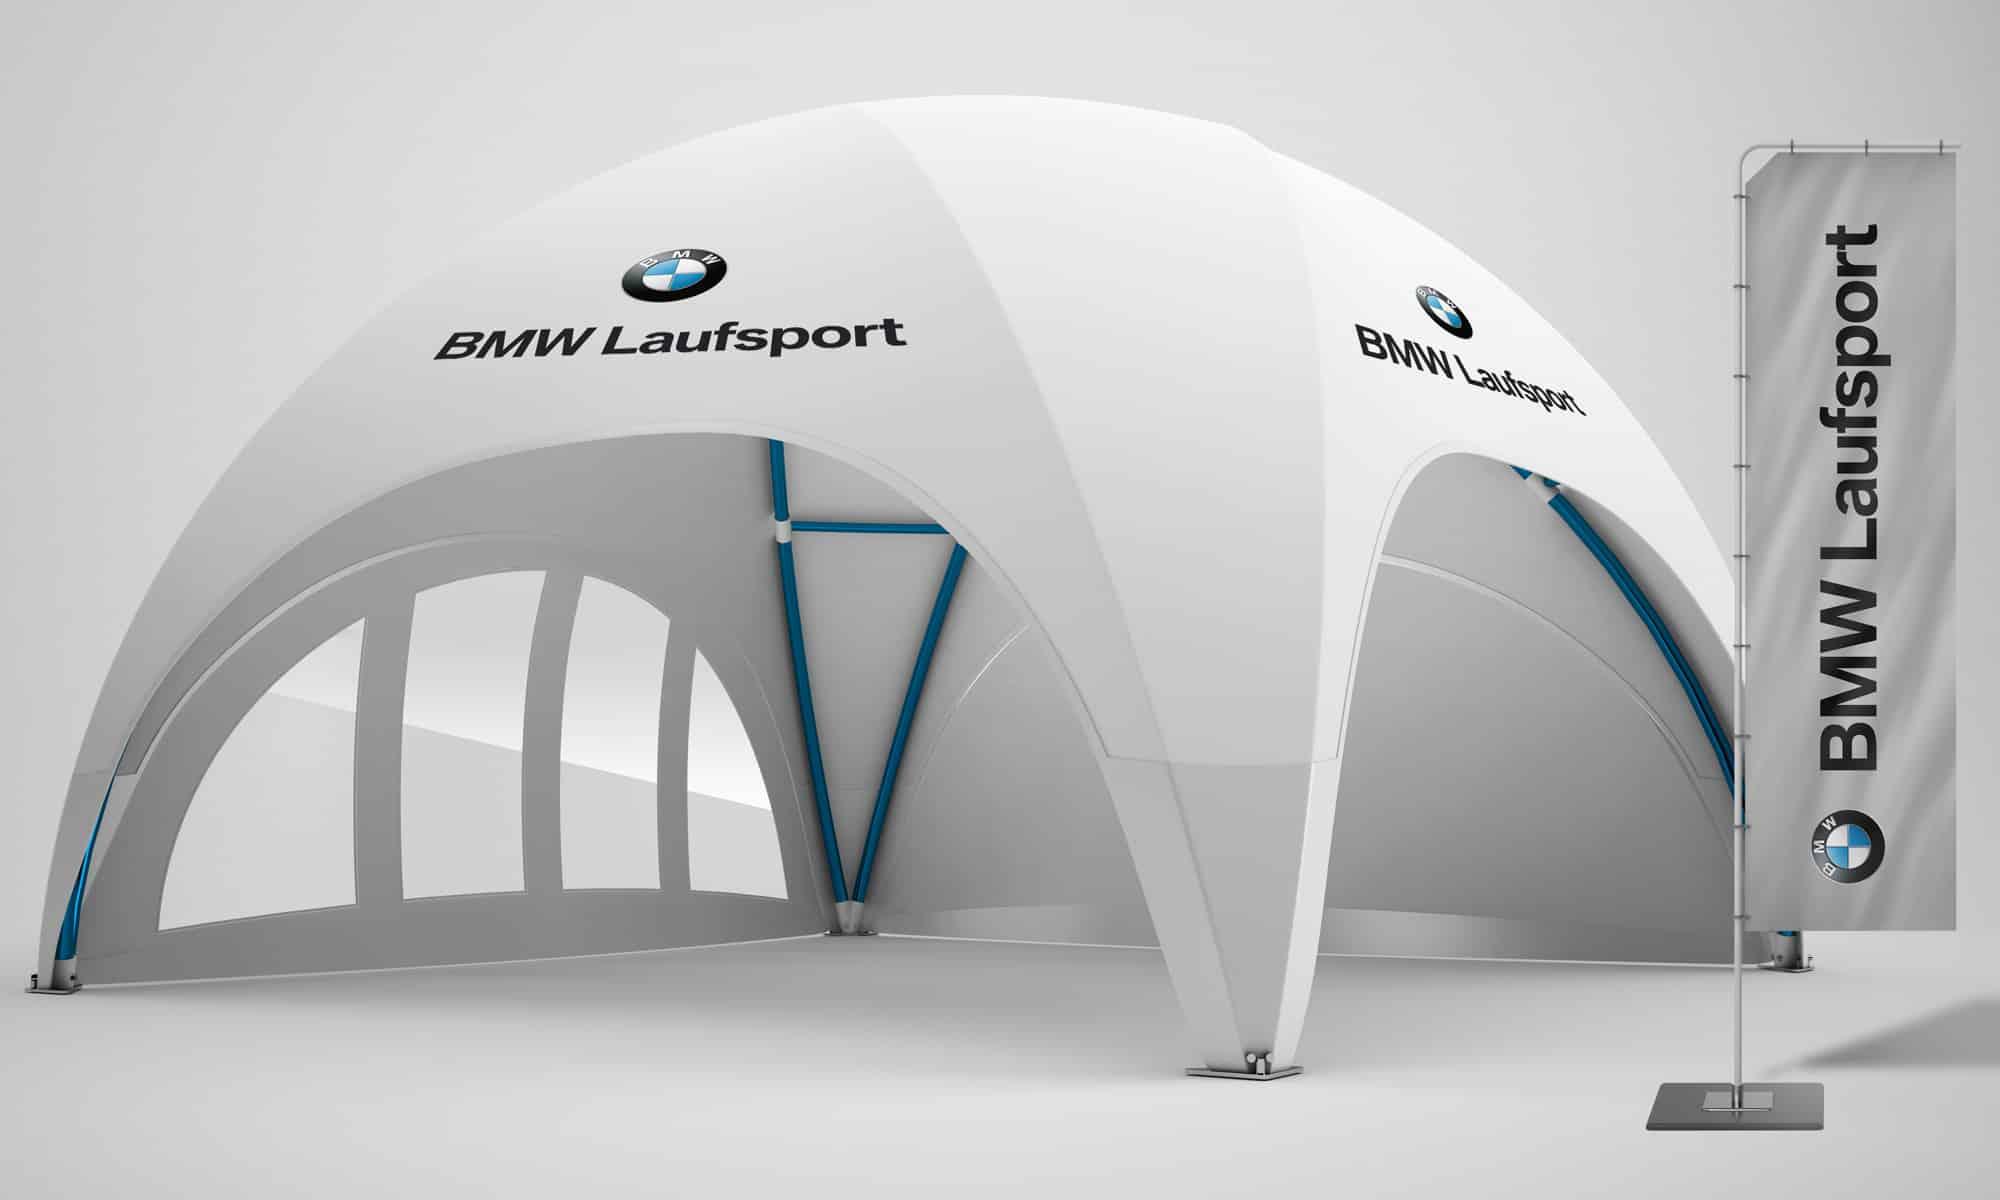 slide-cross-pavillon-flagge-render-03-bmw-laufsport